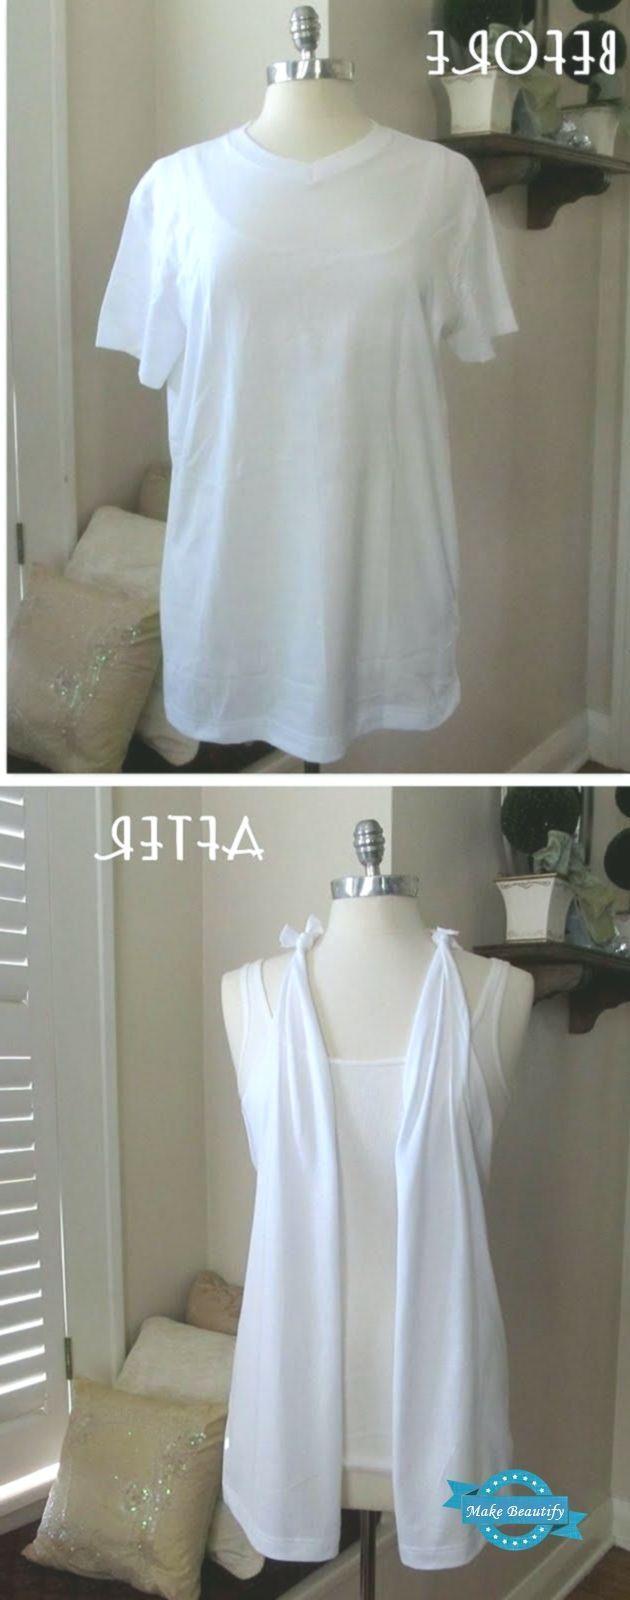 T-Shirt Vest Tutorial | DIY No Sew, T-Shirt Vest: Super cute and easy, no sew, t... #nosewshirts T-Shirt Vest Tutorial | DIY No Sew, T-Shirt Vest: Super cute and easy, no sew, t...,  #Cute #Diy #Easy #sew #summerT-Shirt #Super #TShirt #tutorial #Vest #nosewshirts T-Shirt Vest Tutorial | DIY No Sew, T-Shirt Vest: Super cute and easy, no sew, t... #nosewshirts T-Shirt Vest Tutorial | DIY No Sew, T-Shirt Vest: Super cute and easy, no sew, t...,  #Cute #Diy #Easy #sew #summerT-Shirt #Super #TShirt # #nosewshirts